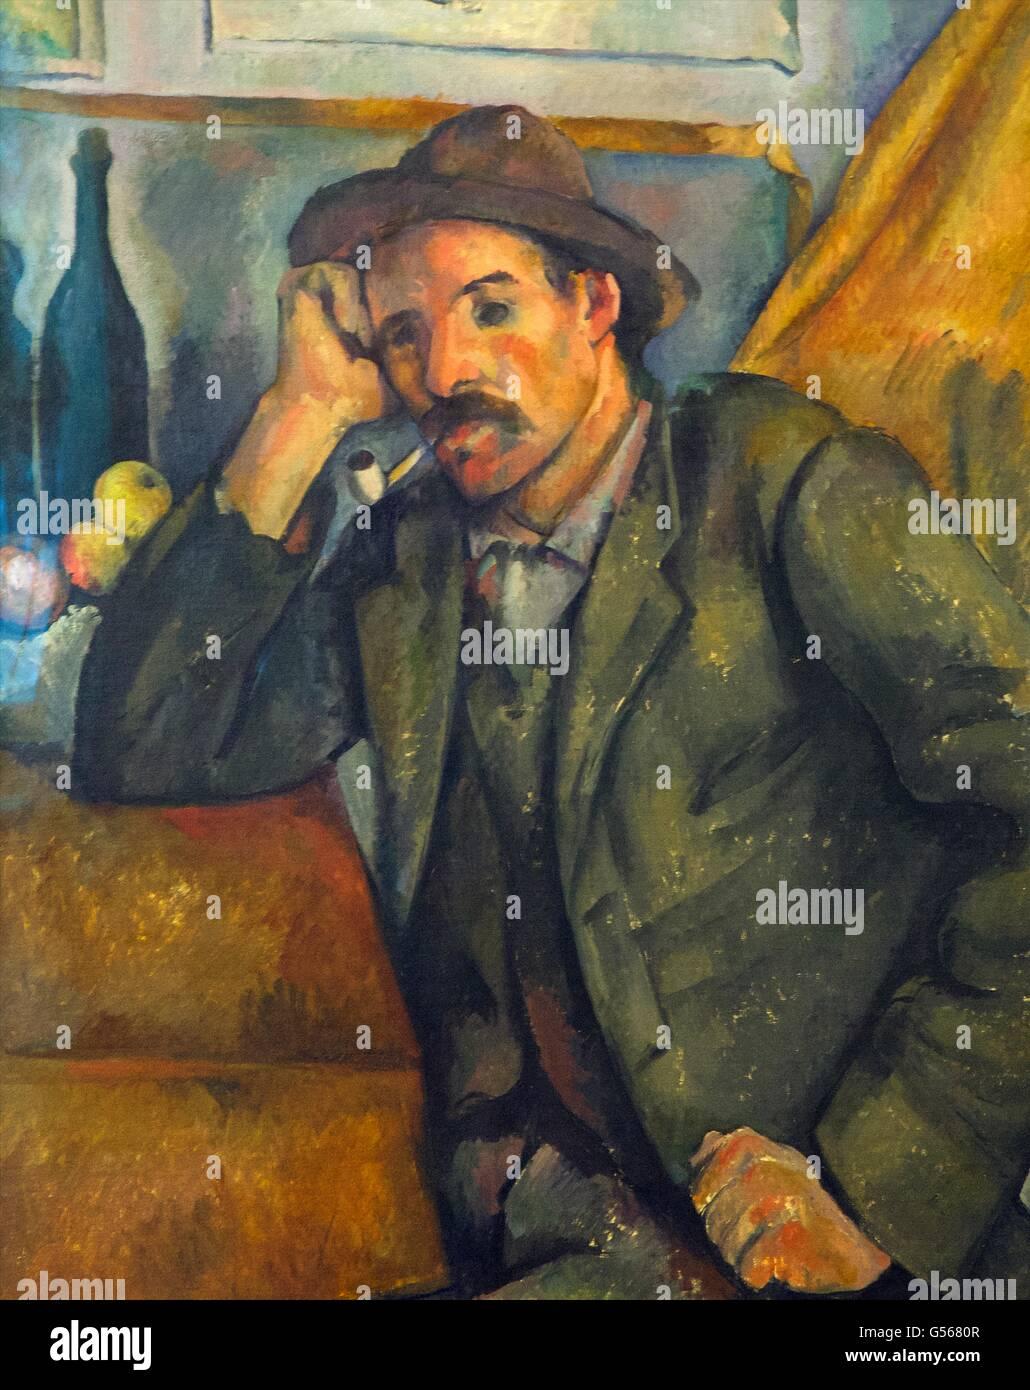 Smoker, by Paul Cezanne, 1890-1892, State Hermitage Museum, Saint Petersburg, Russia - Stock Image